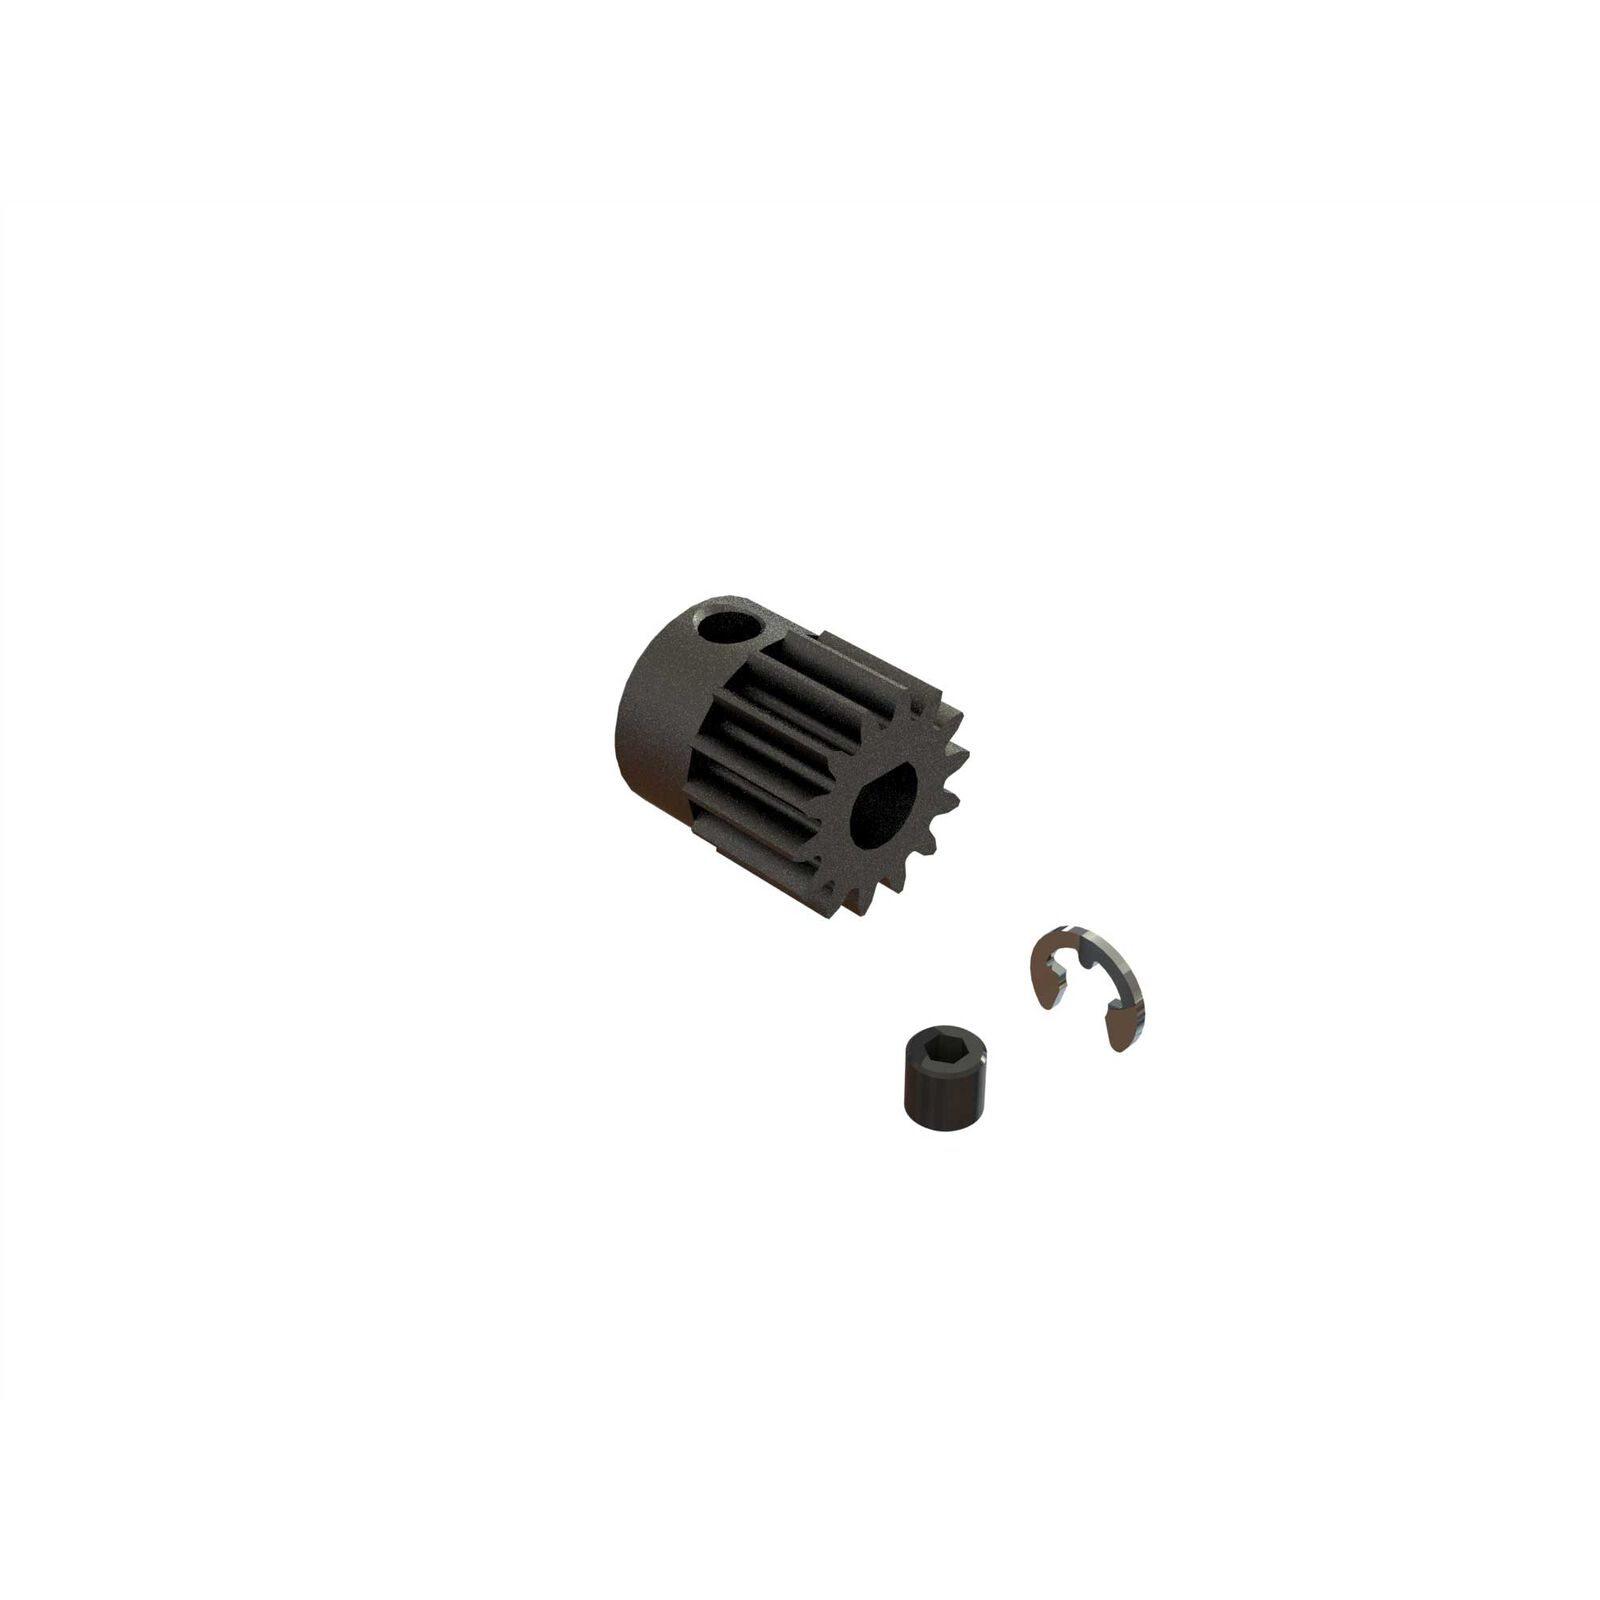 14T 0.8Mod Safe-D5 Pinion Gear